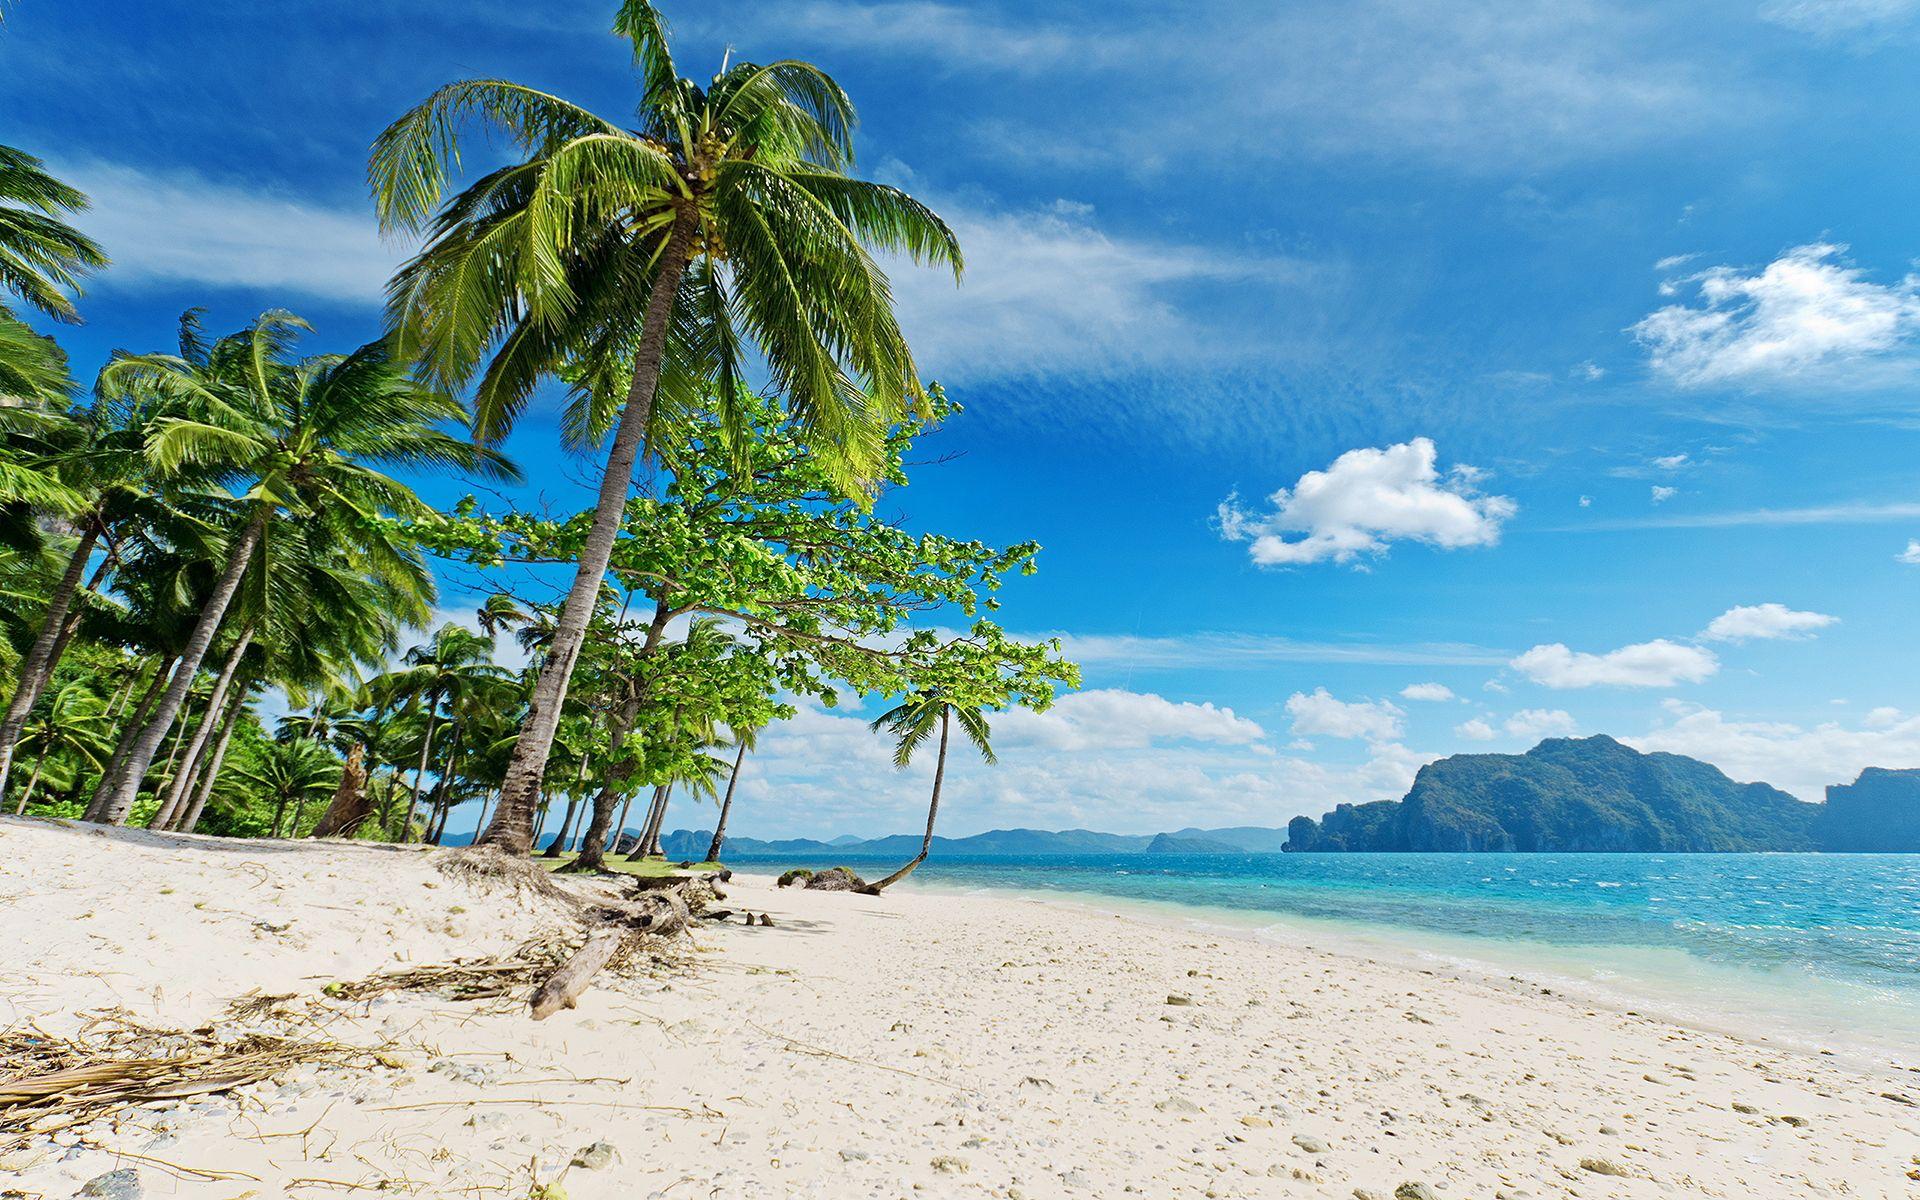 Sunny Tropical Beach Palms Hd Wallpaper Beach Wallpaper Summer Beach Pictures Beach Photos